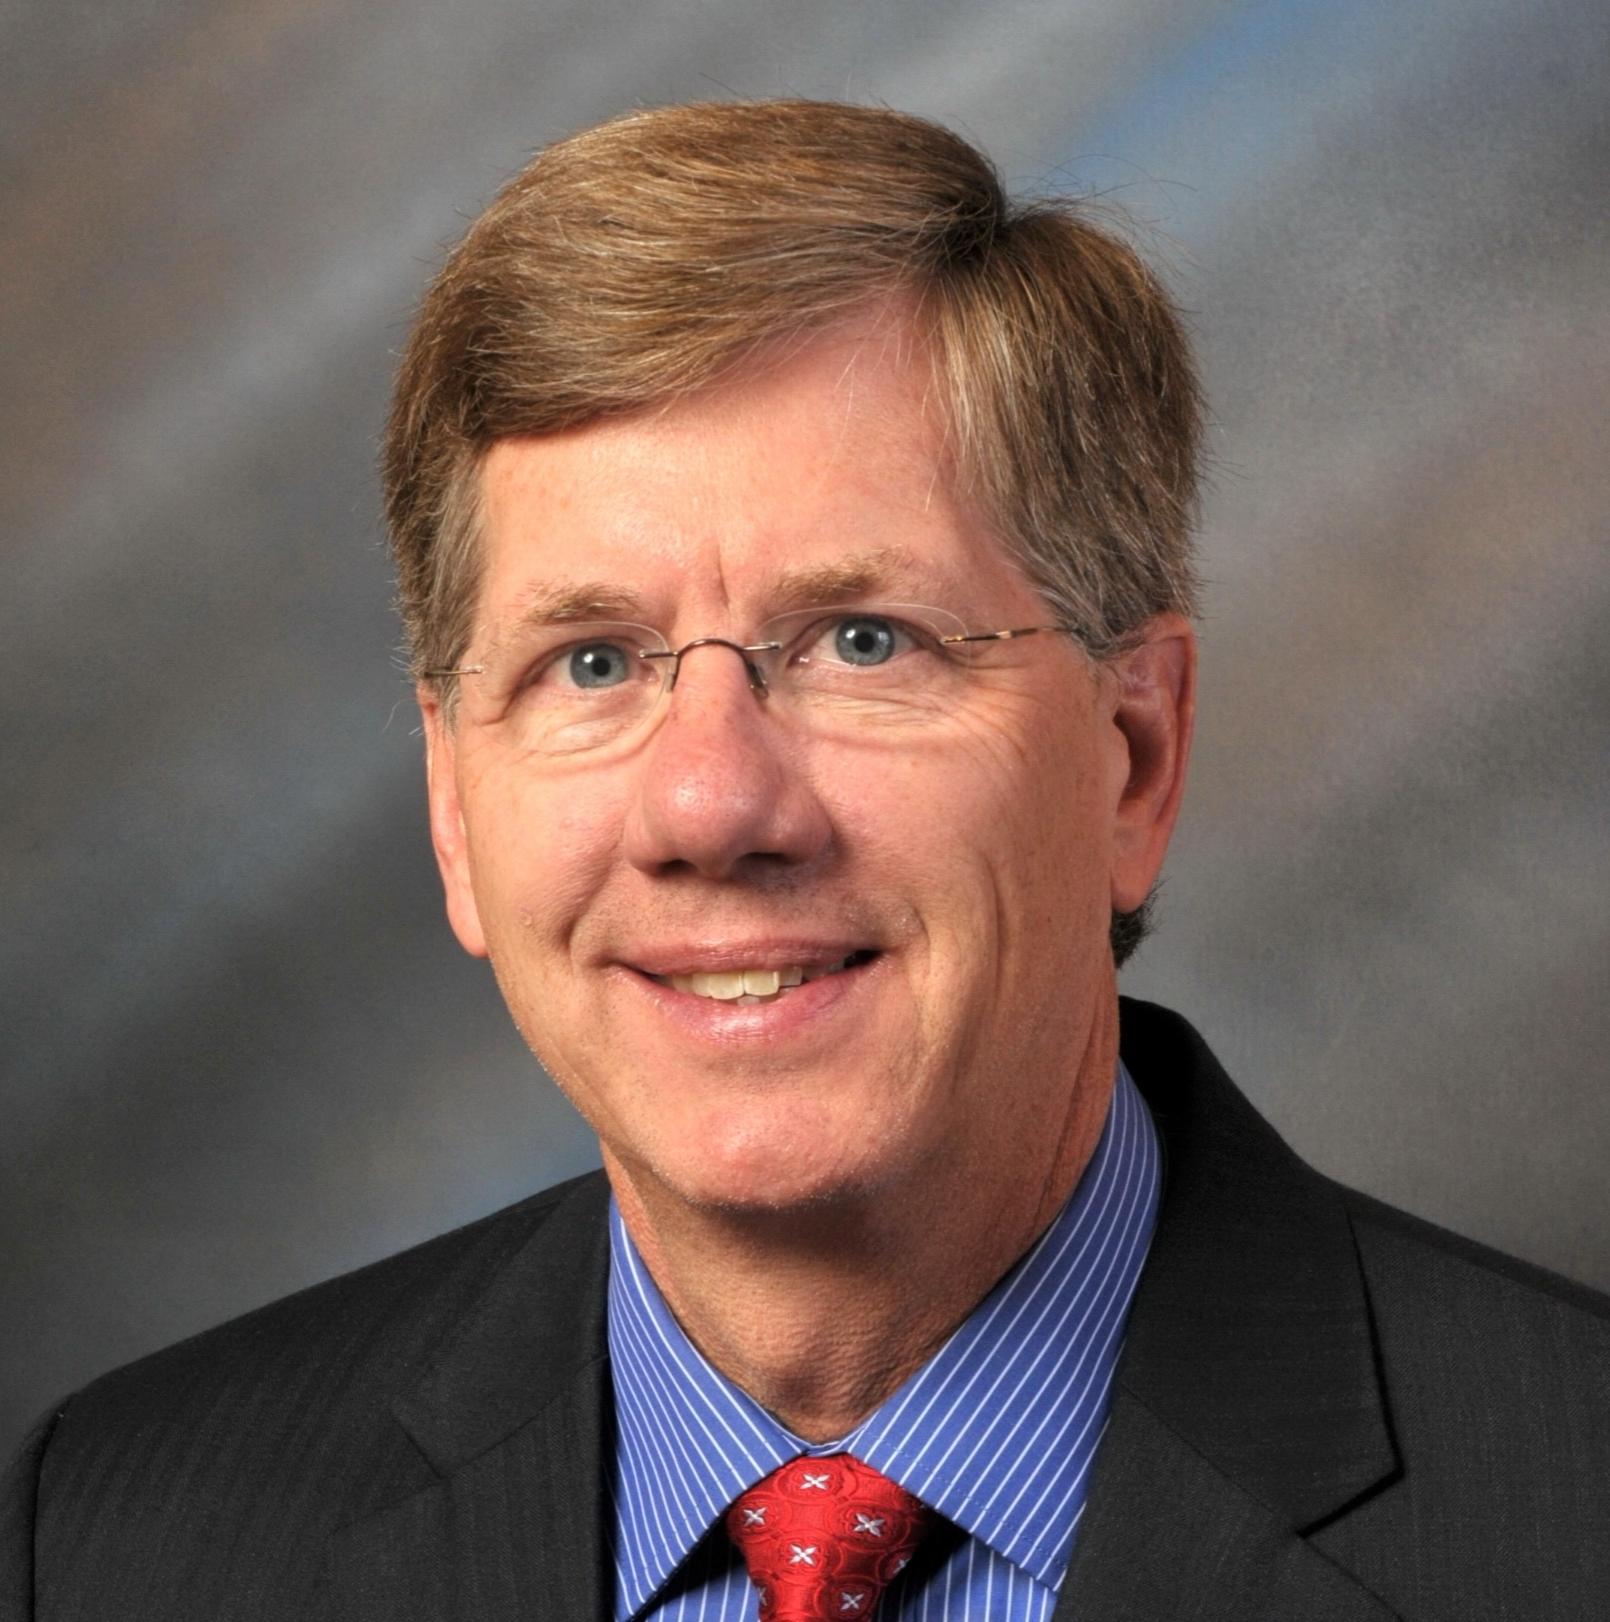 John Kessler, Pharm.D. - Founder and Chief Clinical Officer, Second Story HealthAdjunct Associate Professor, University of North Carolina School of Pharmacy